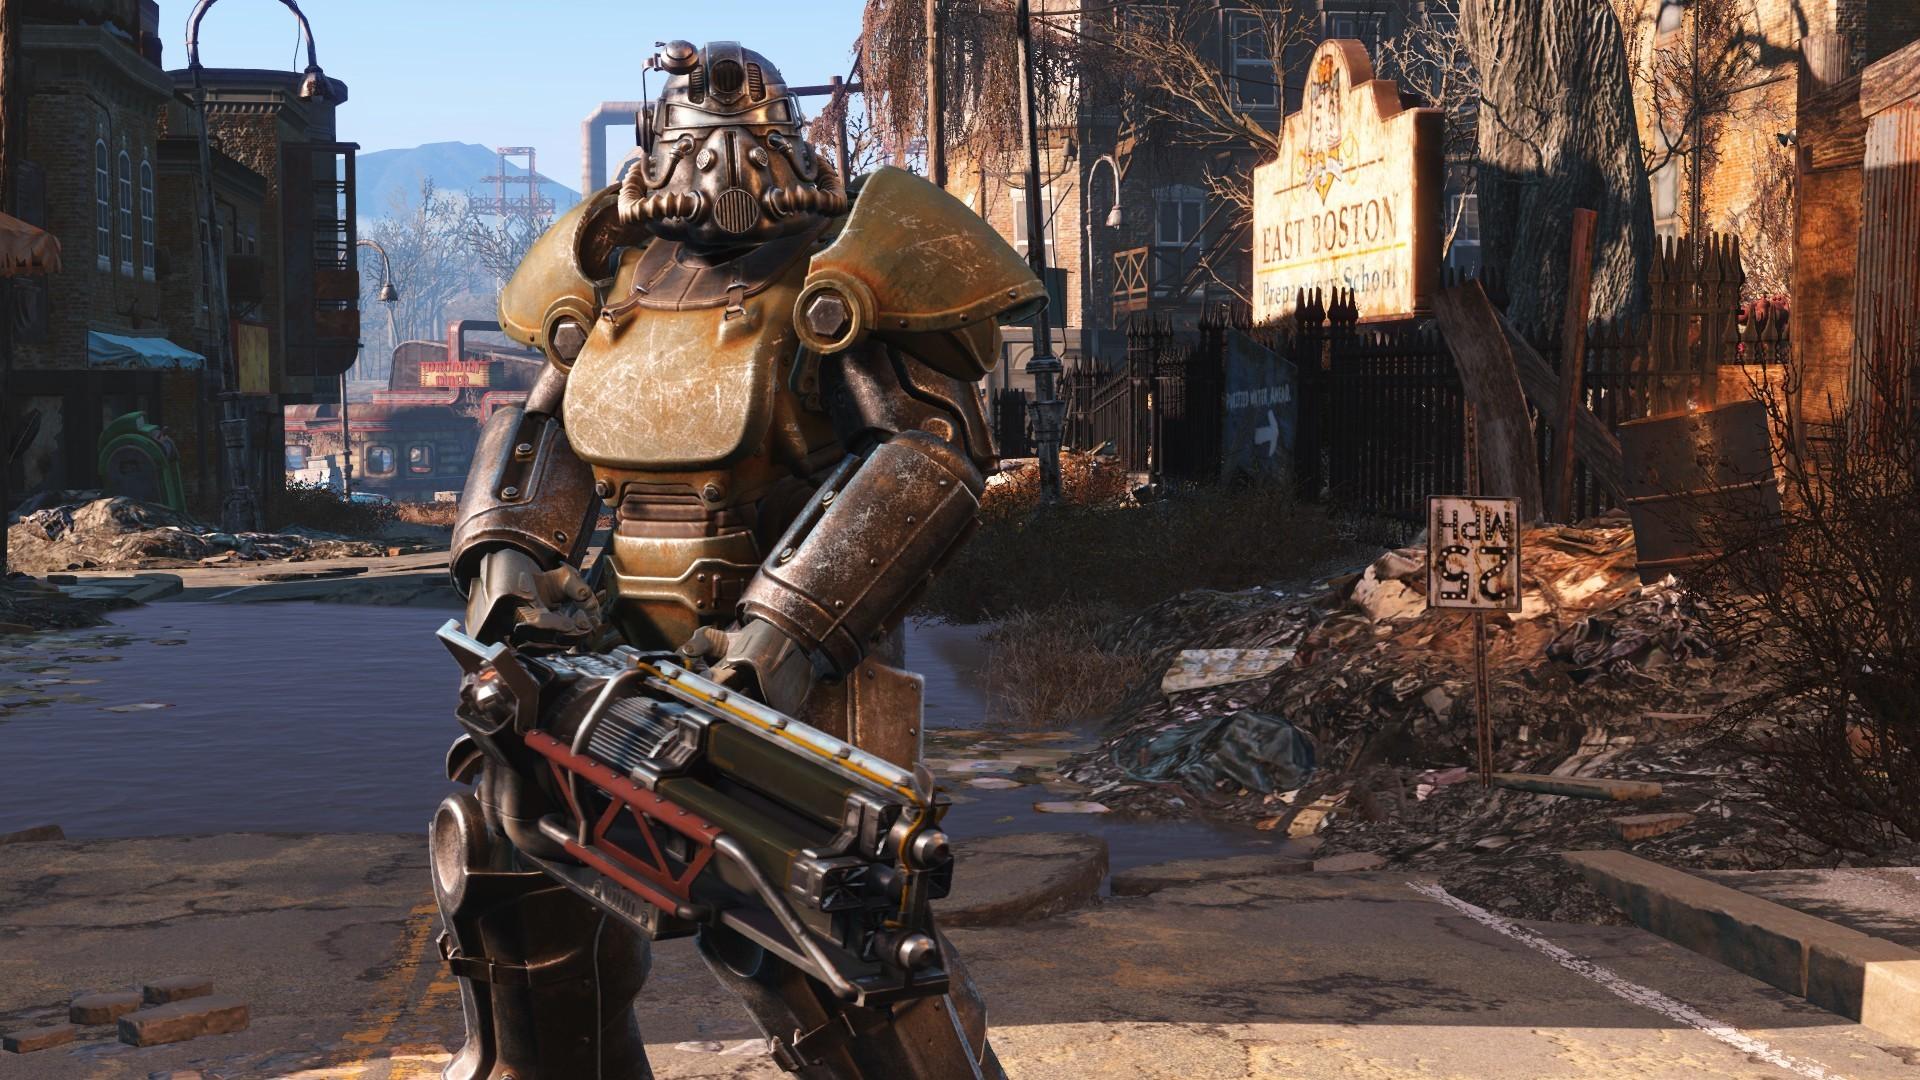 Fallout 4 Ultimate Guide - GameSpot